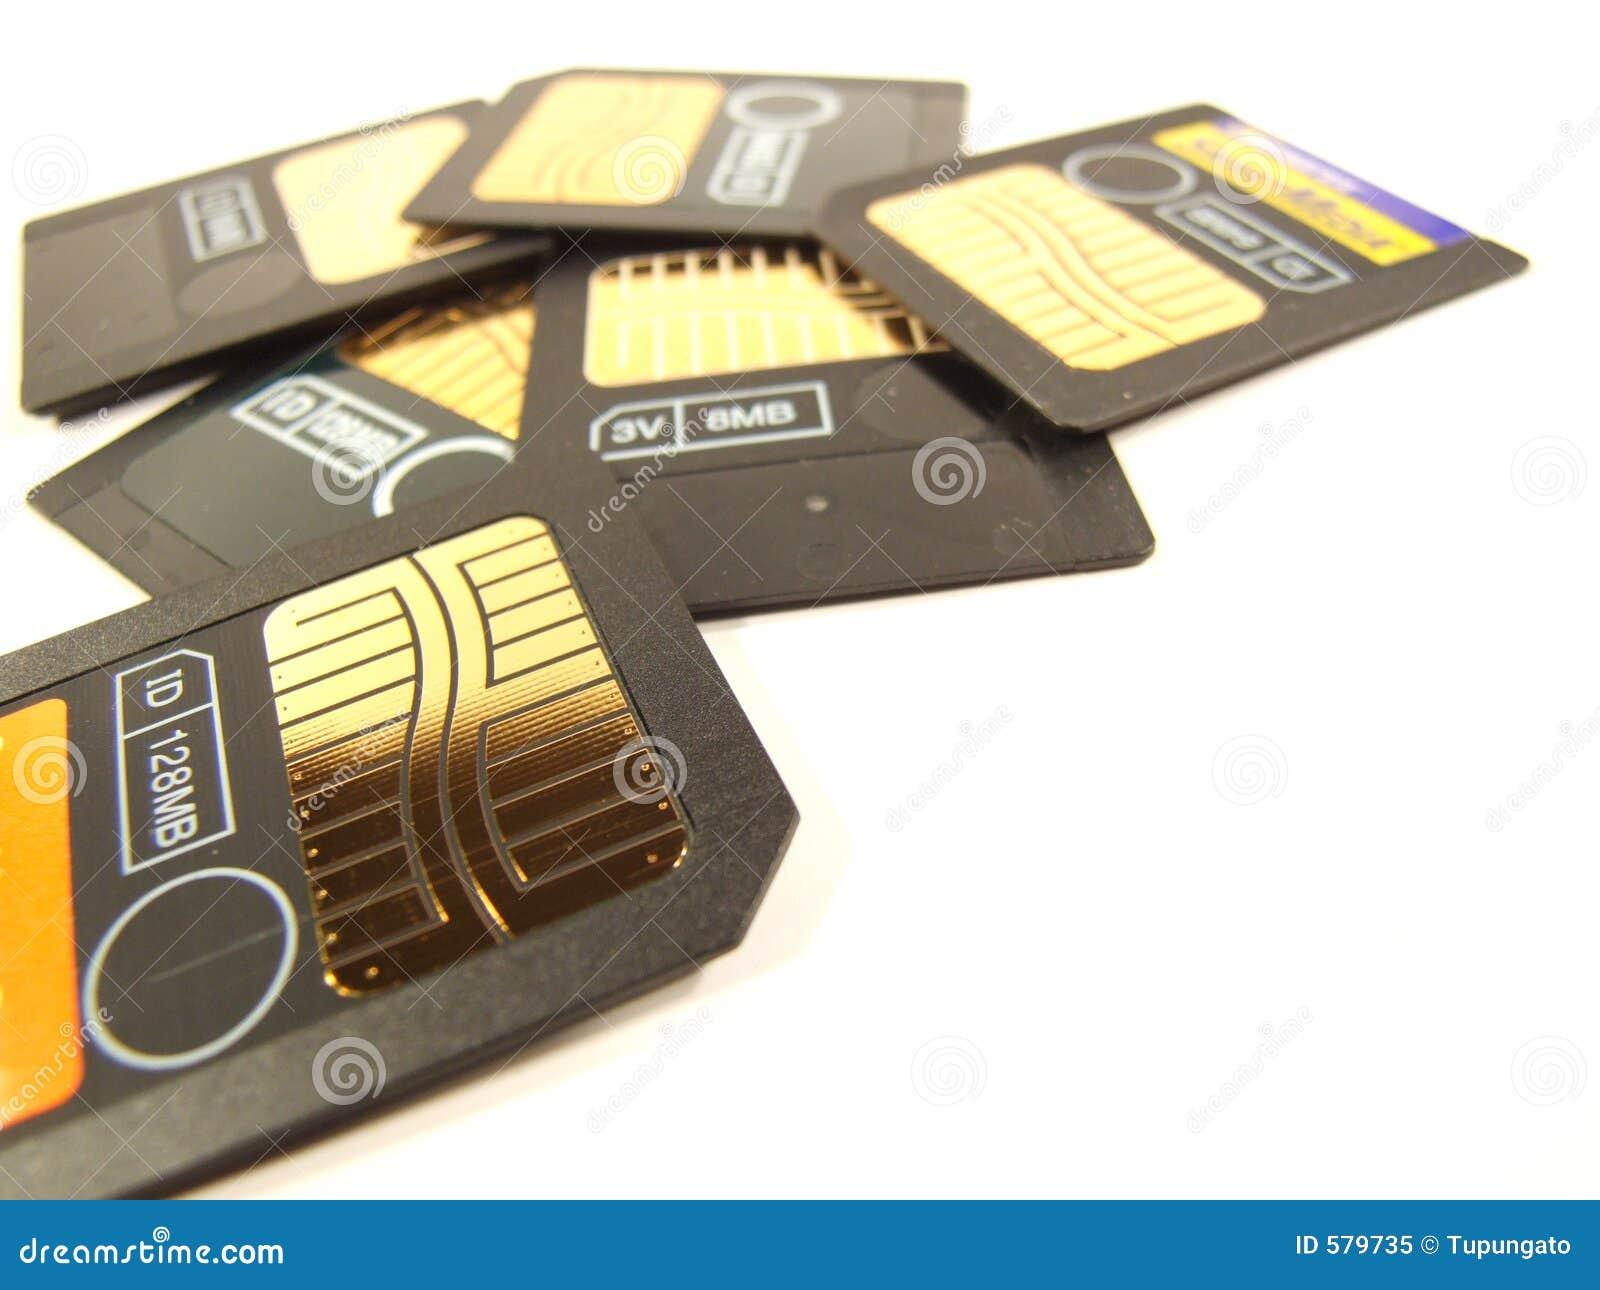 Memory cards lot